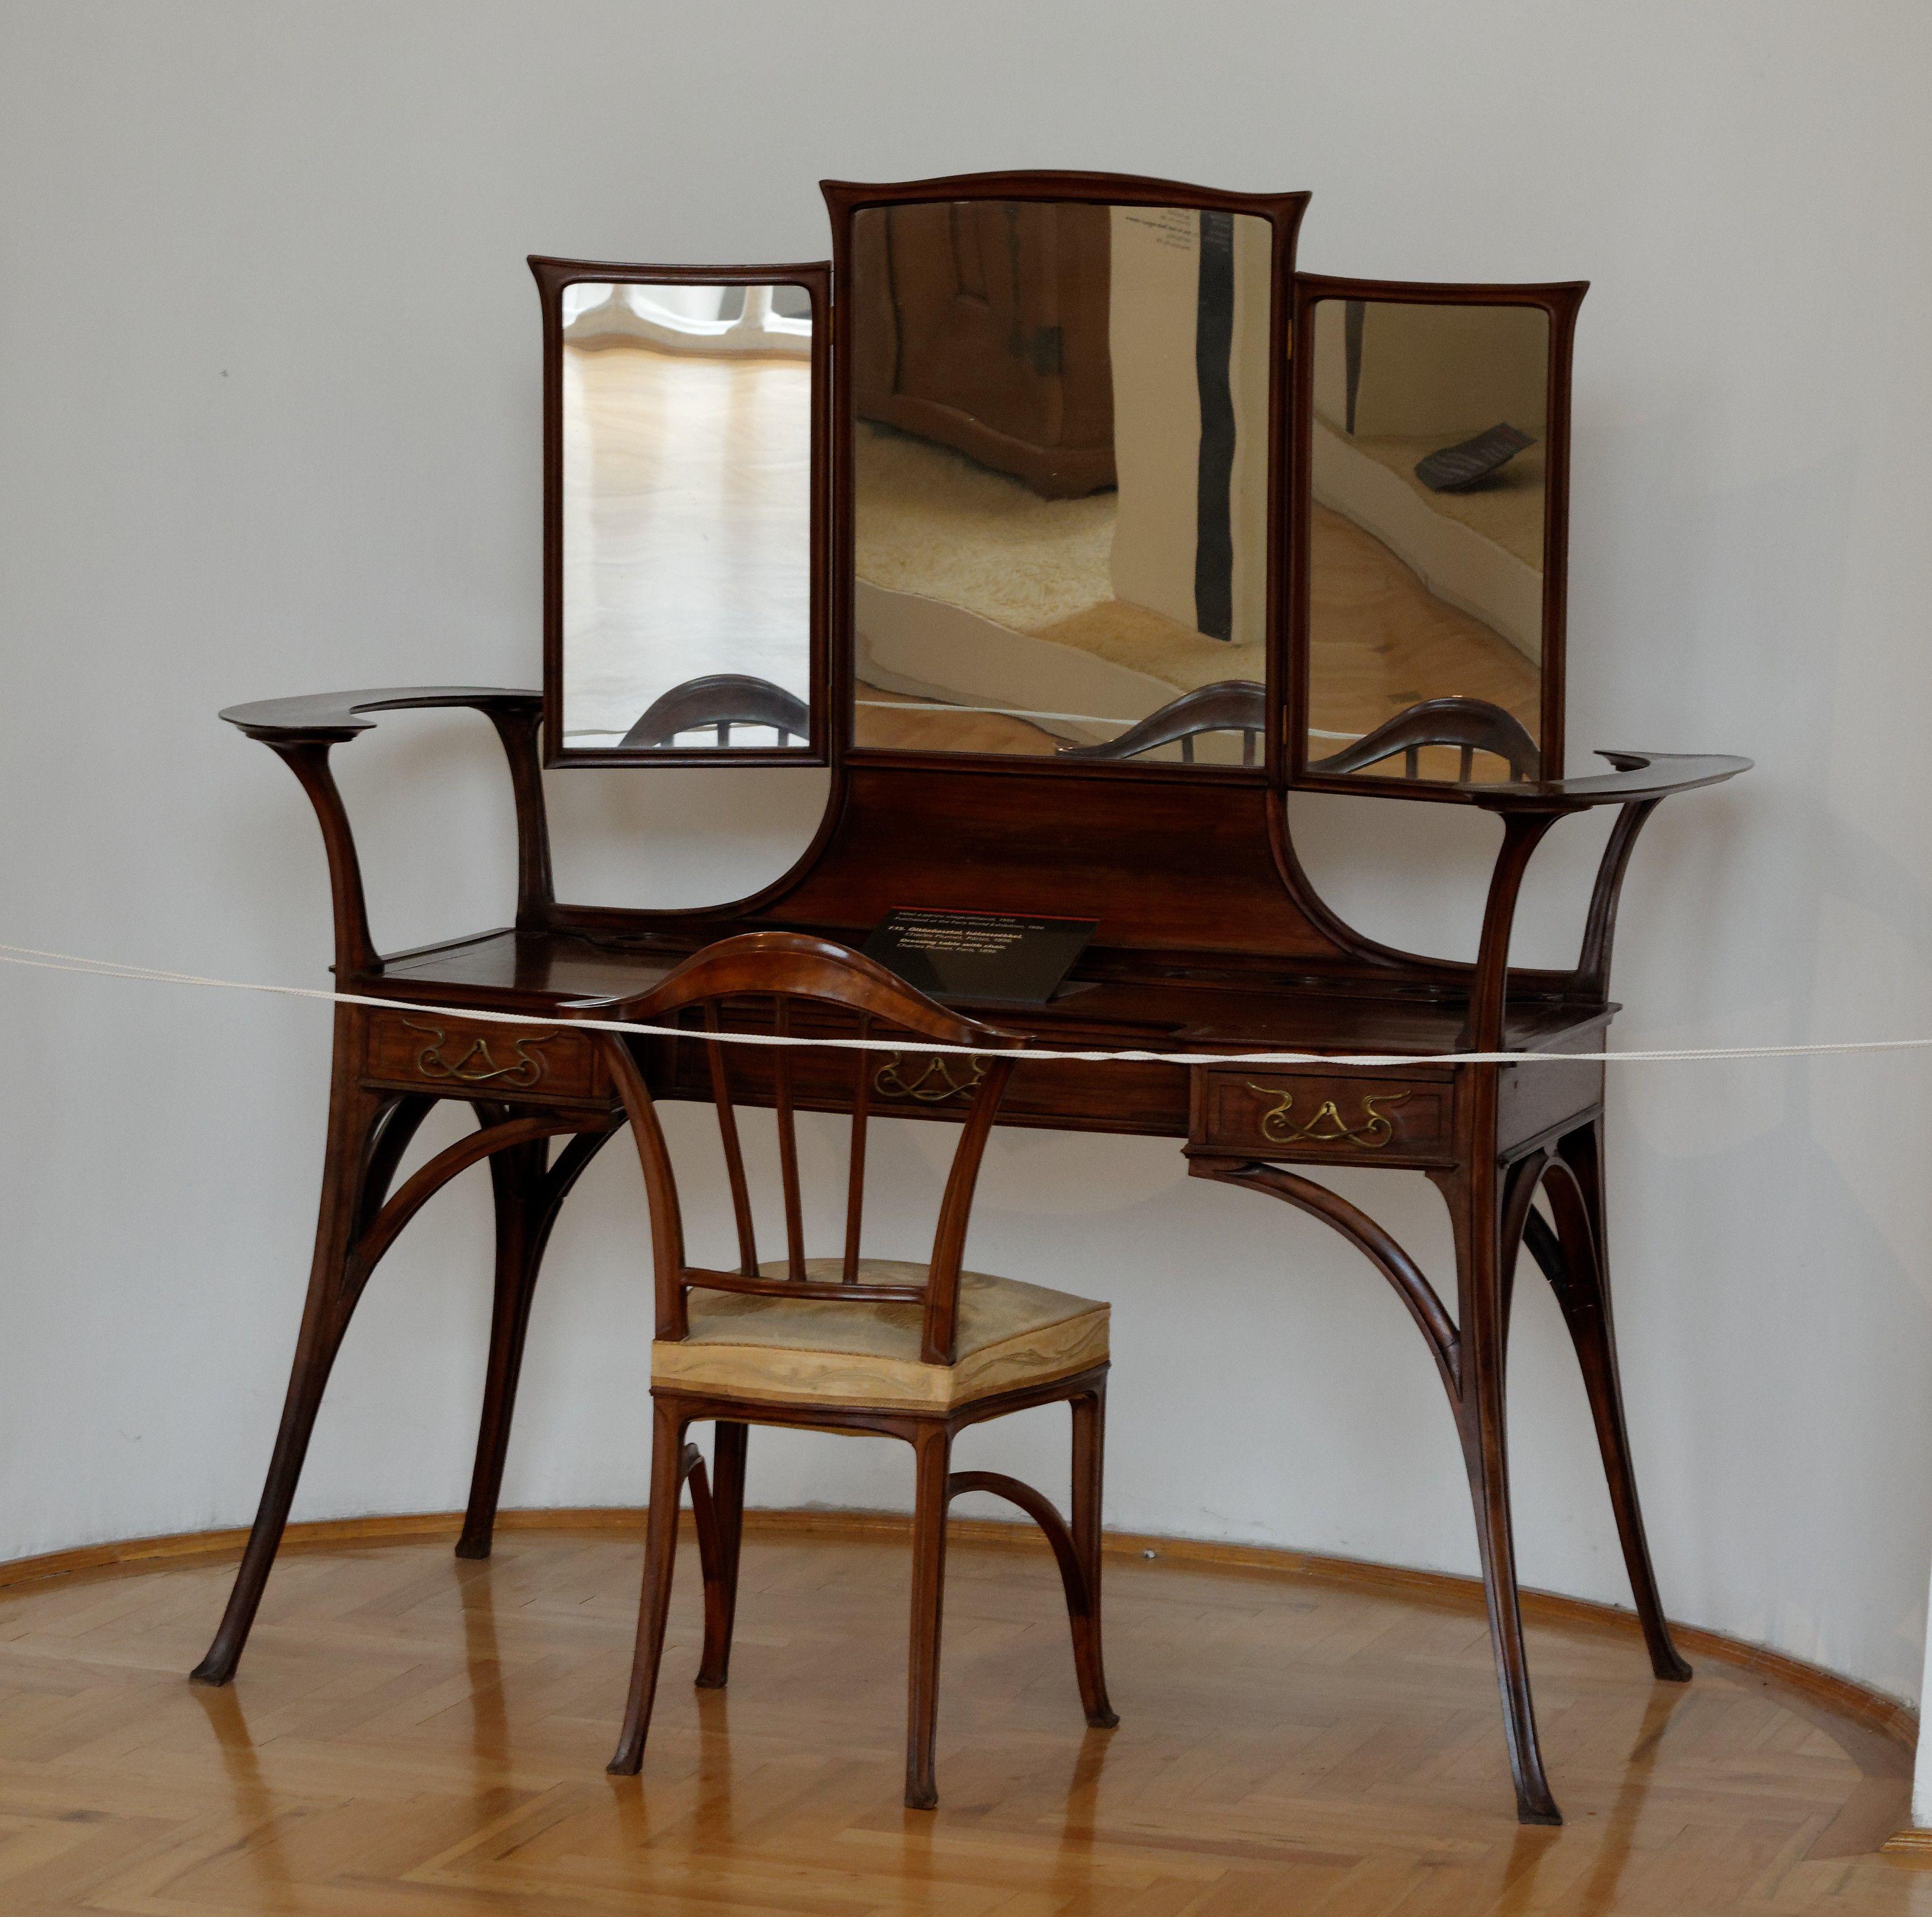 25 Marvelous Bedroom Vanity Chair With Back Ideas Bedroom Design